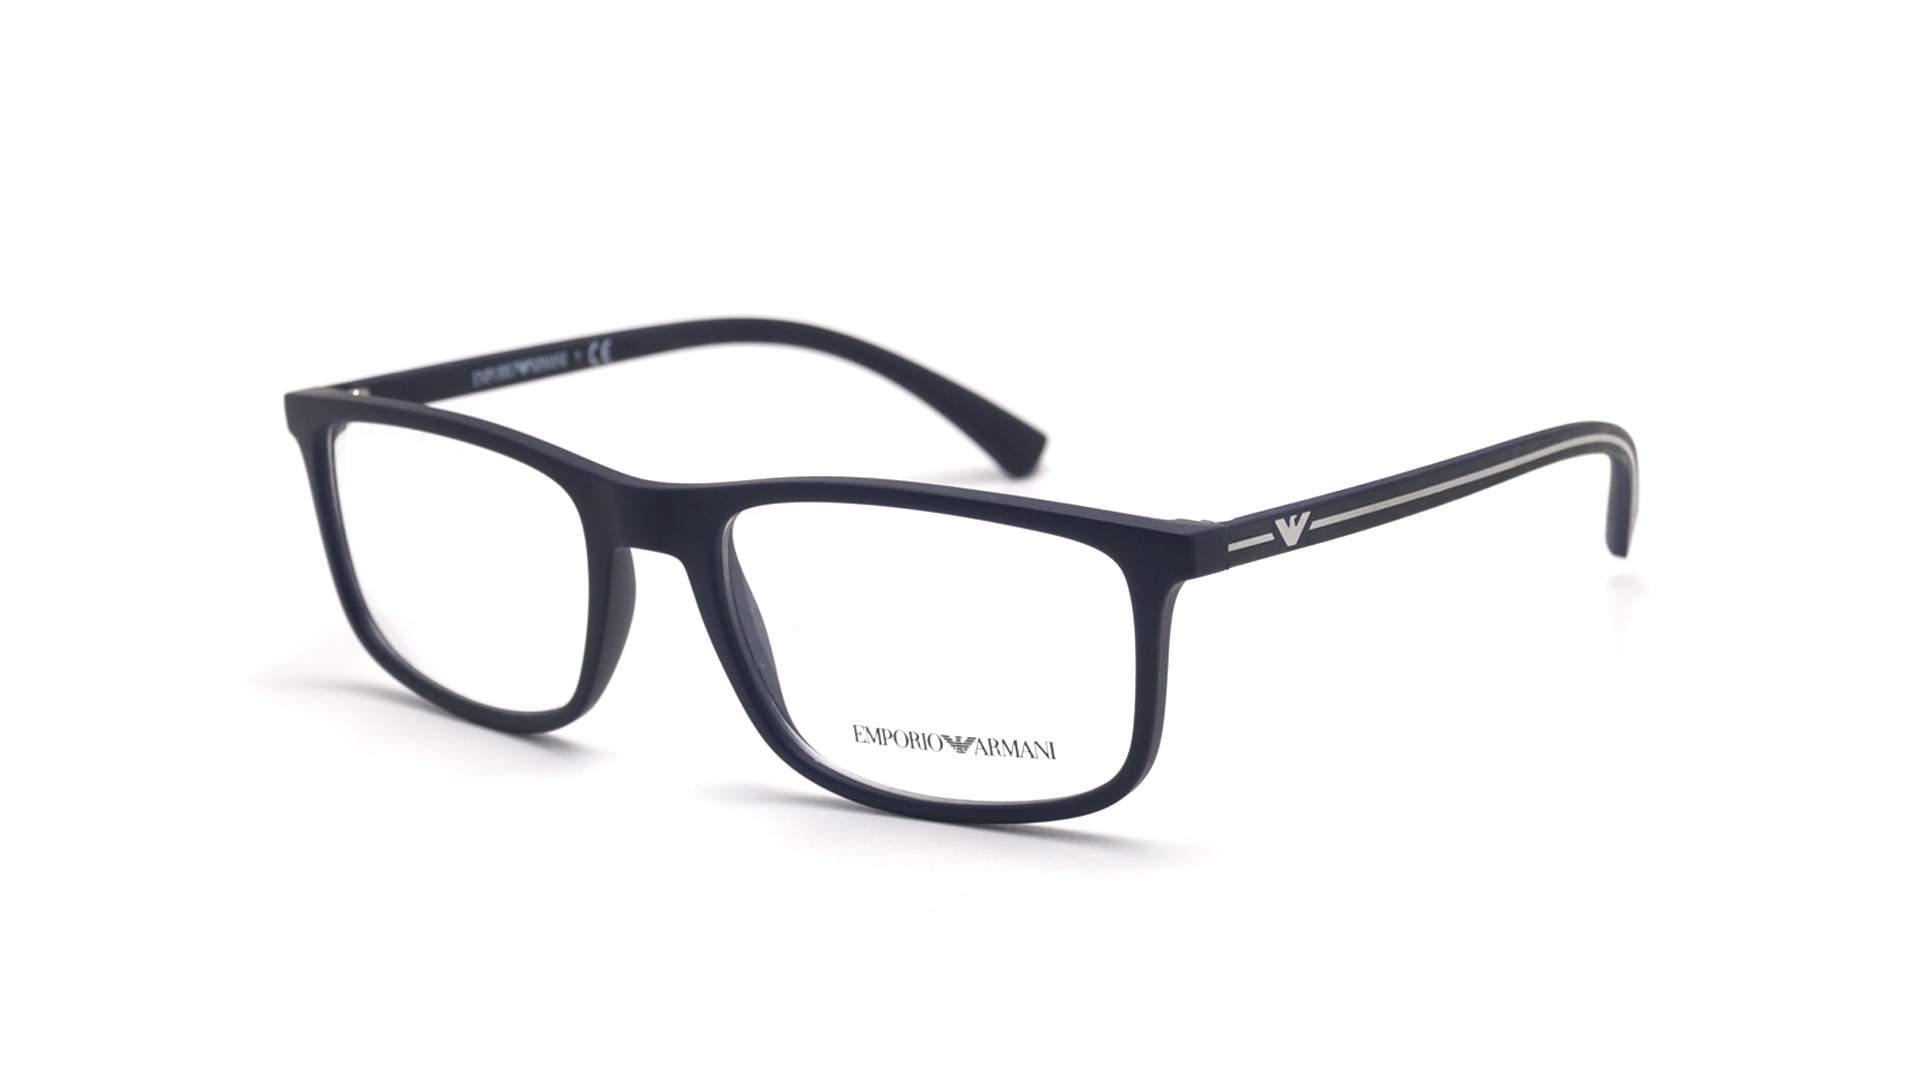 bba14c223290 Eyeglasses Emporio Armani EA3135 5692 53-18 Blue Matte Medium